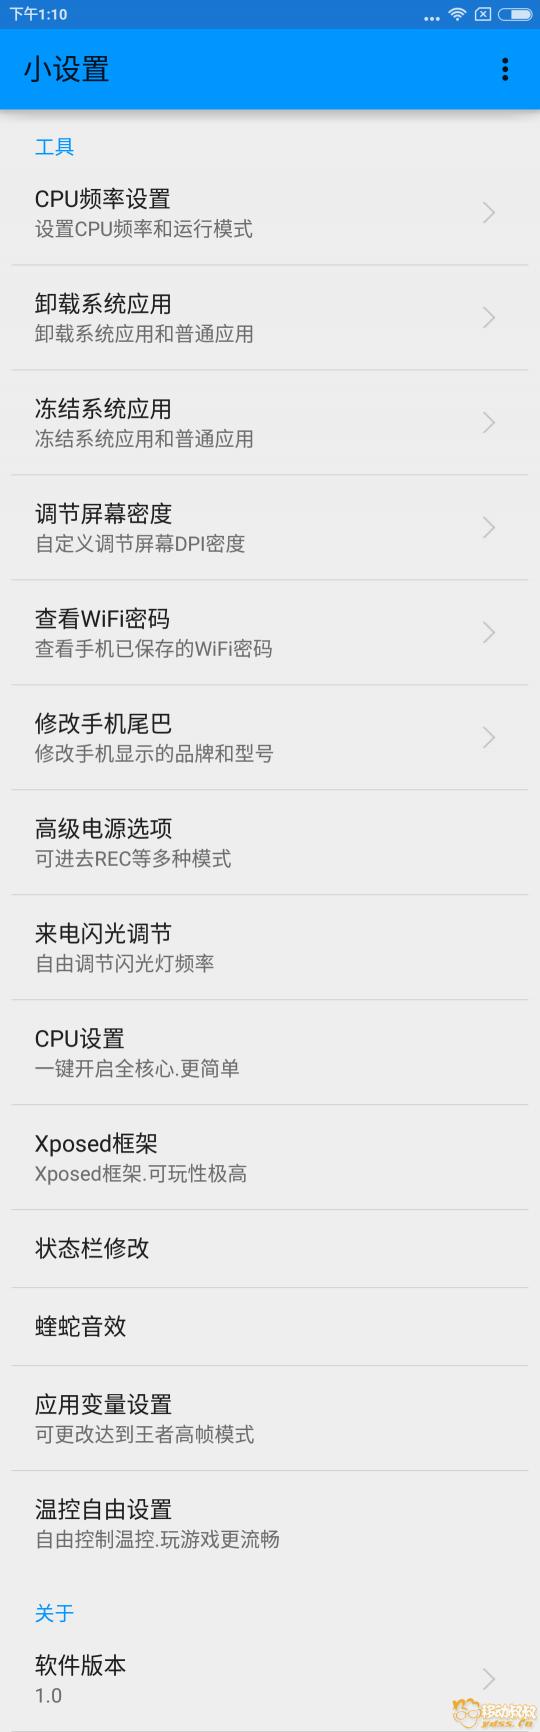 Screenshot_2017-11-29-13-10-19-051_com.zhanhong.tools.png